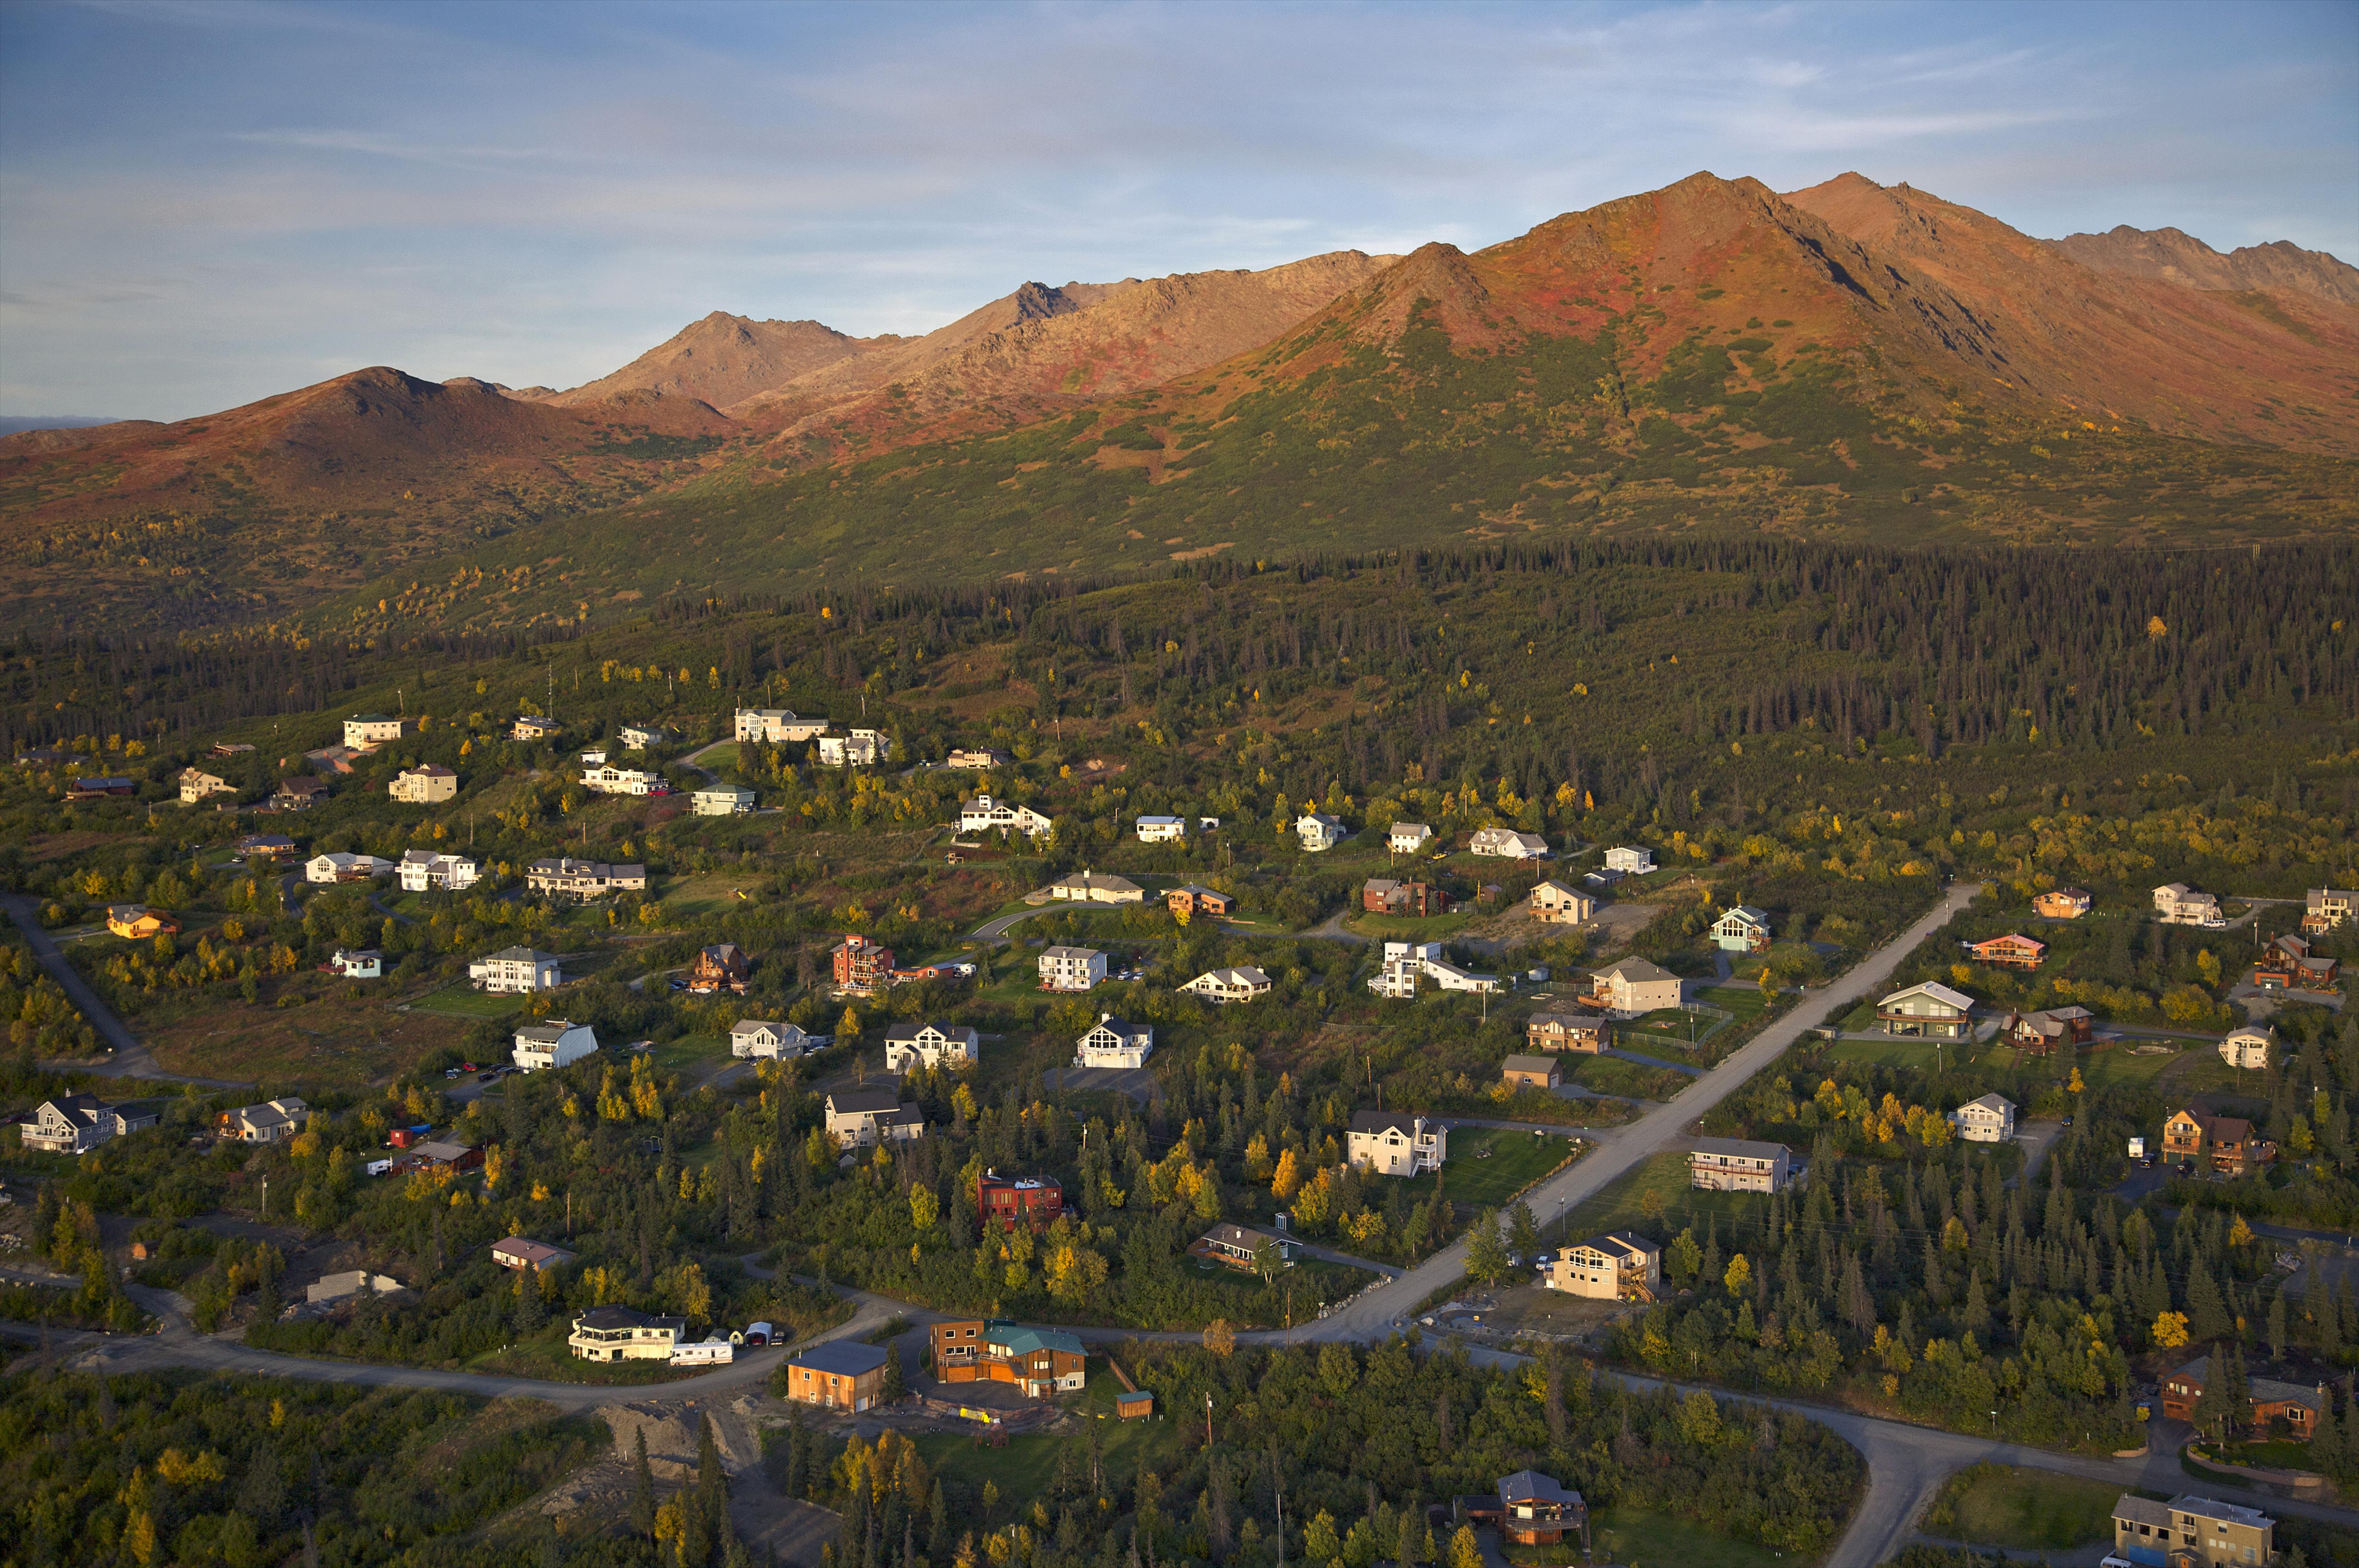 Aerial Over Residential Neighborhoods Along The Anchorage Hillside, Alaska